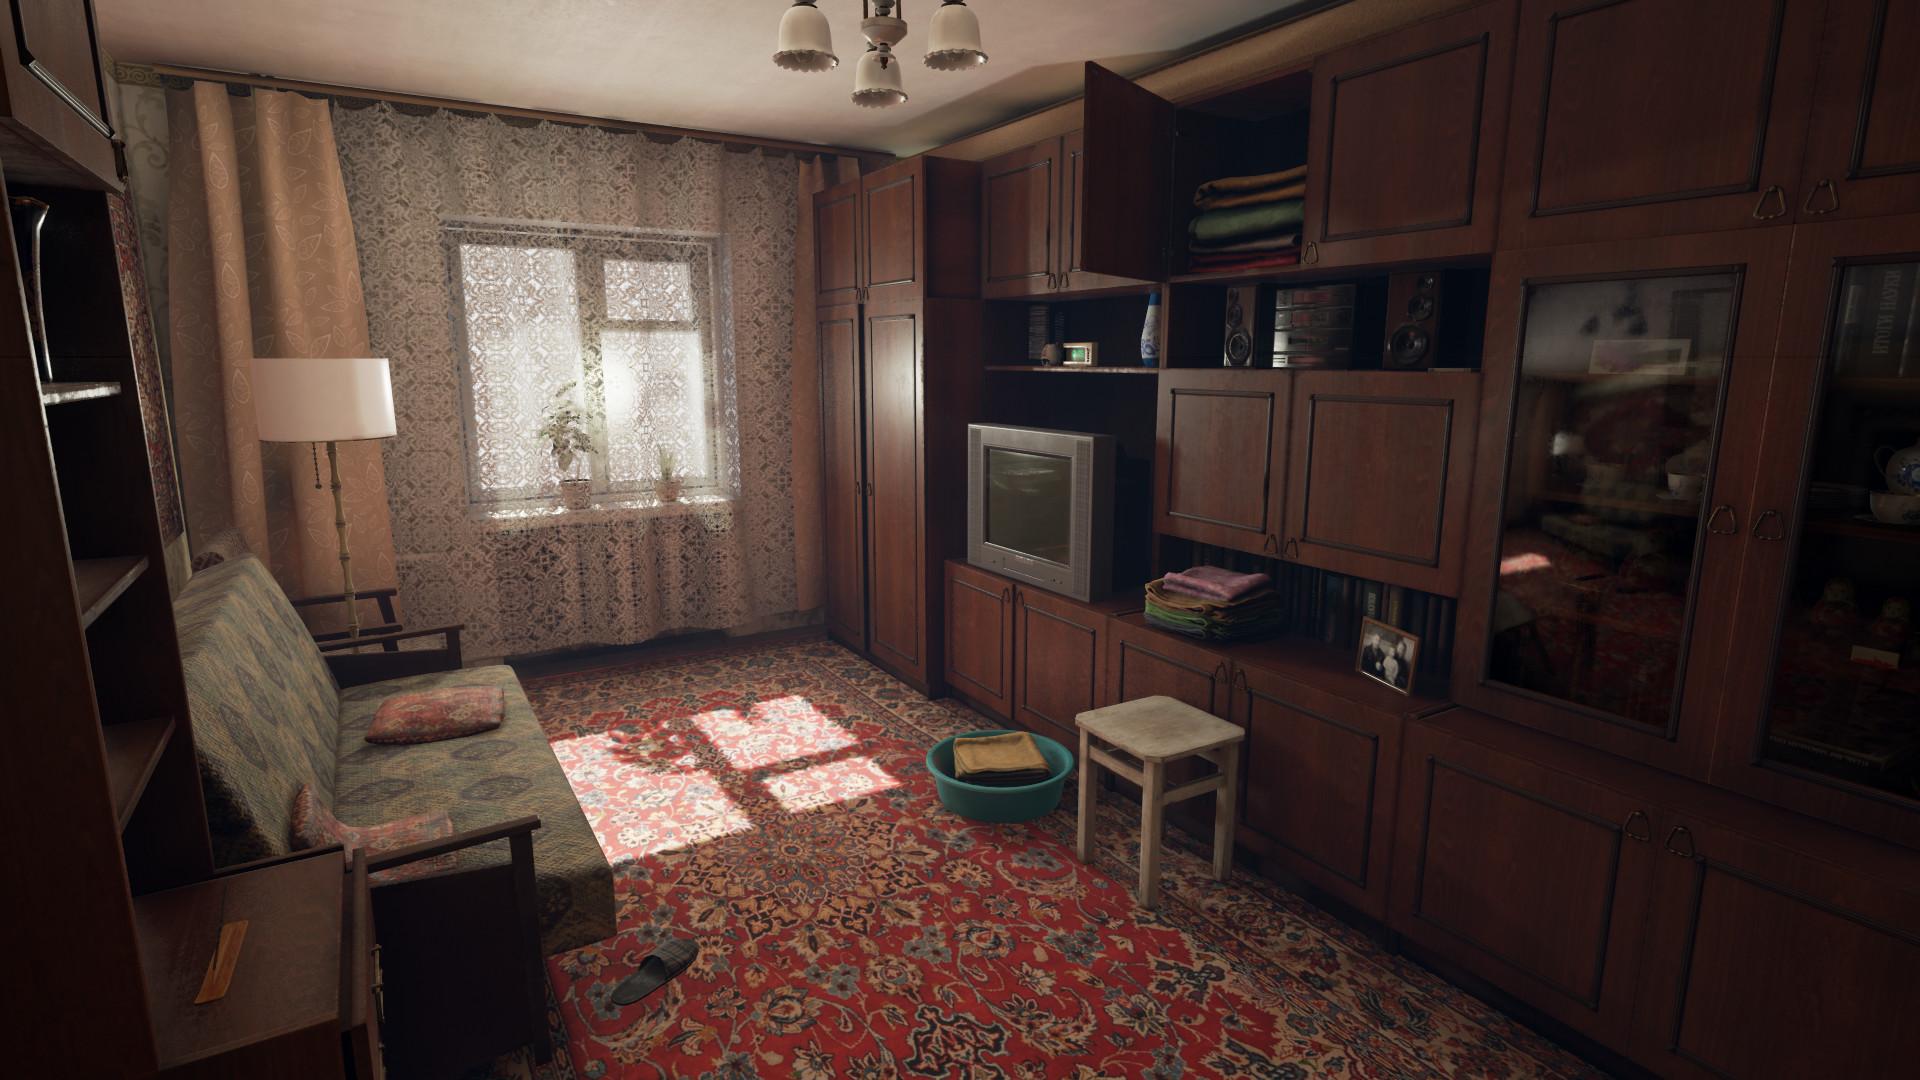 aleksandr-goryachev-screenshot00006.jpg?